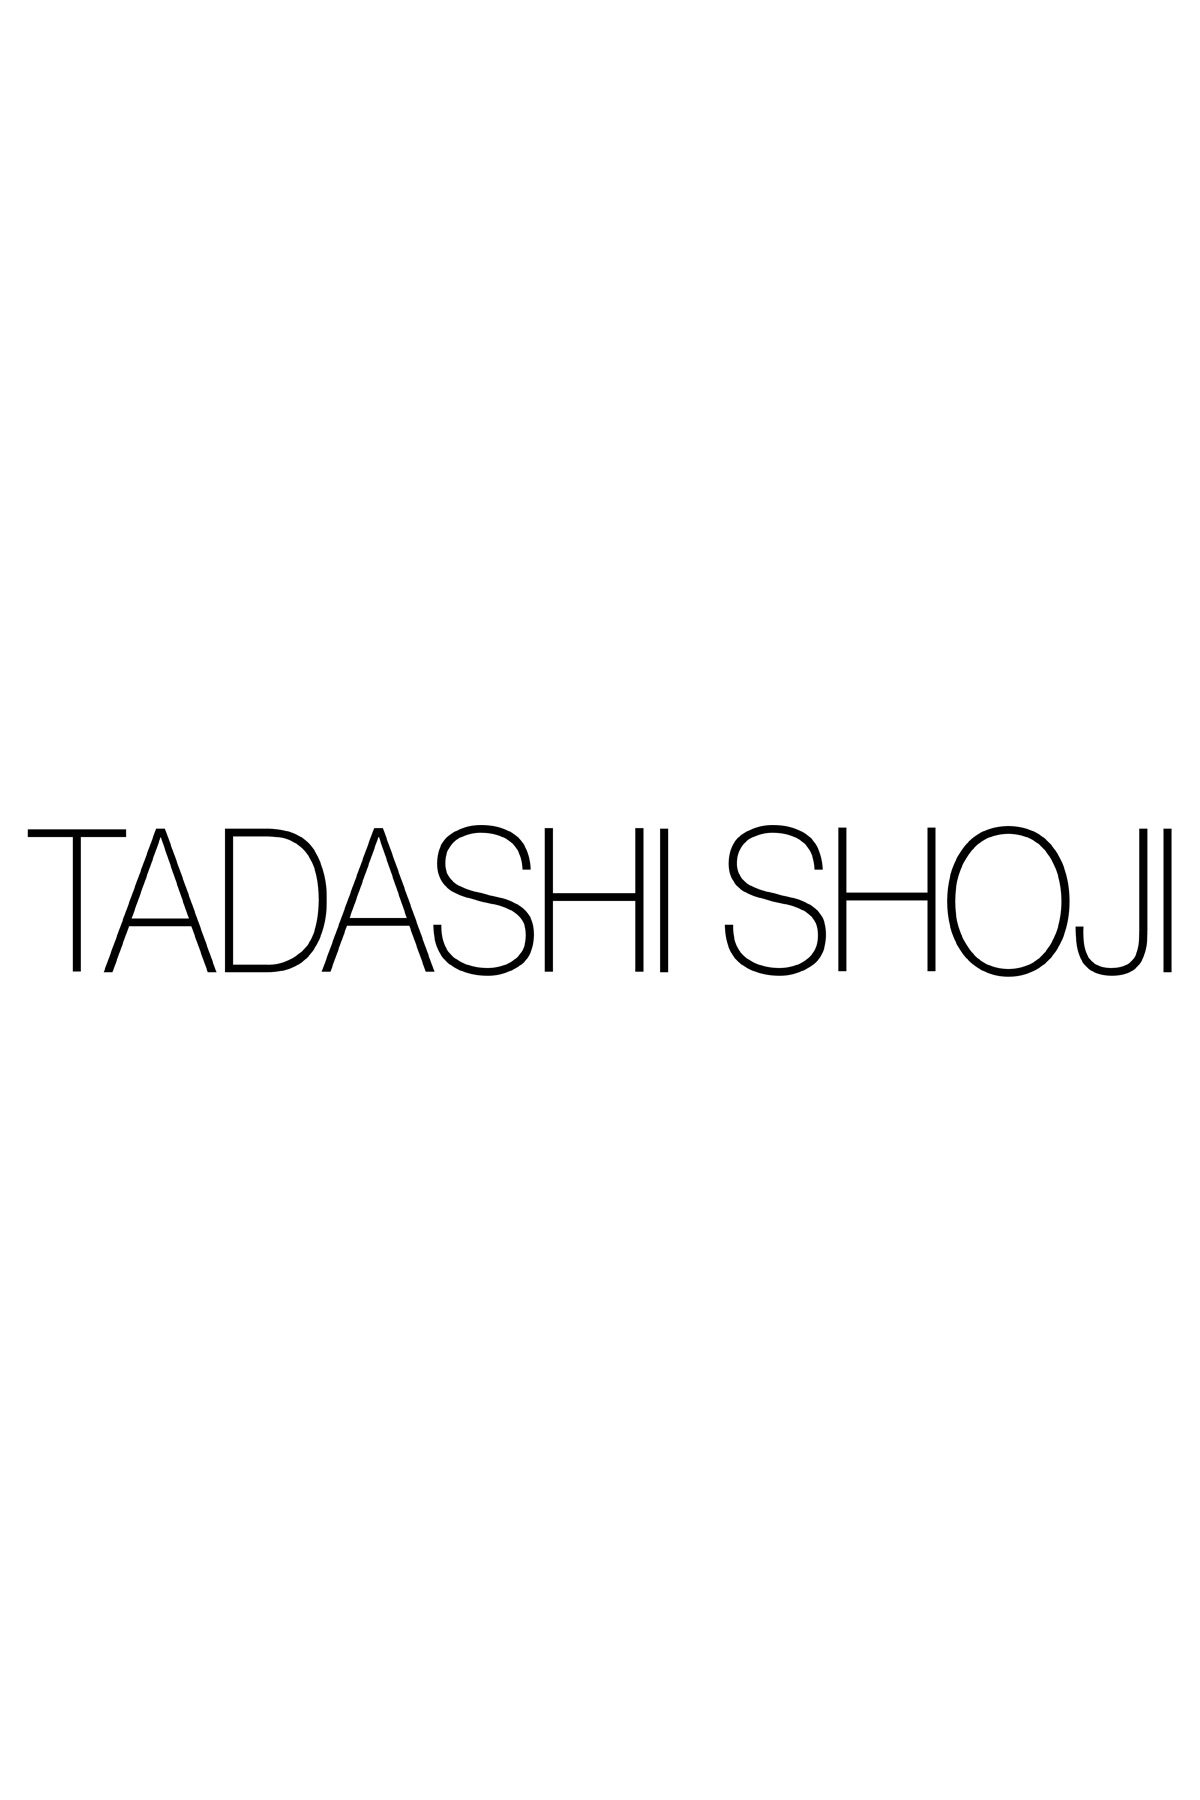 Tadashi Shoji - Louise Dress - Detail